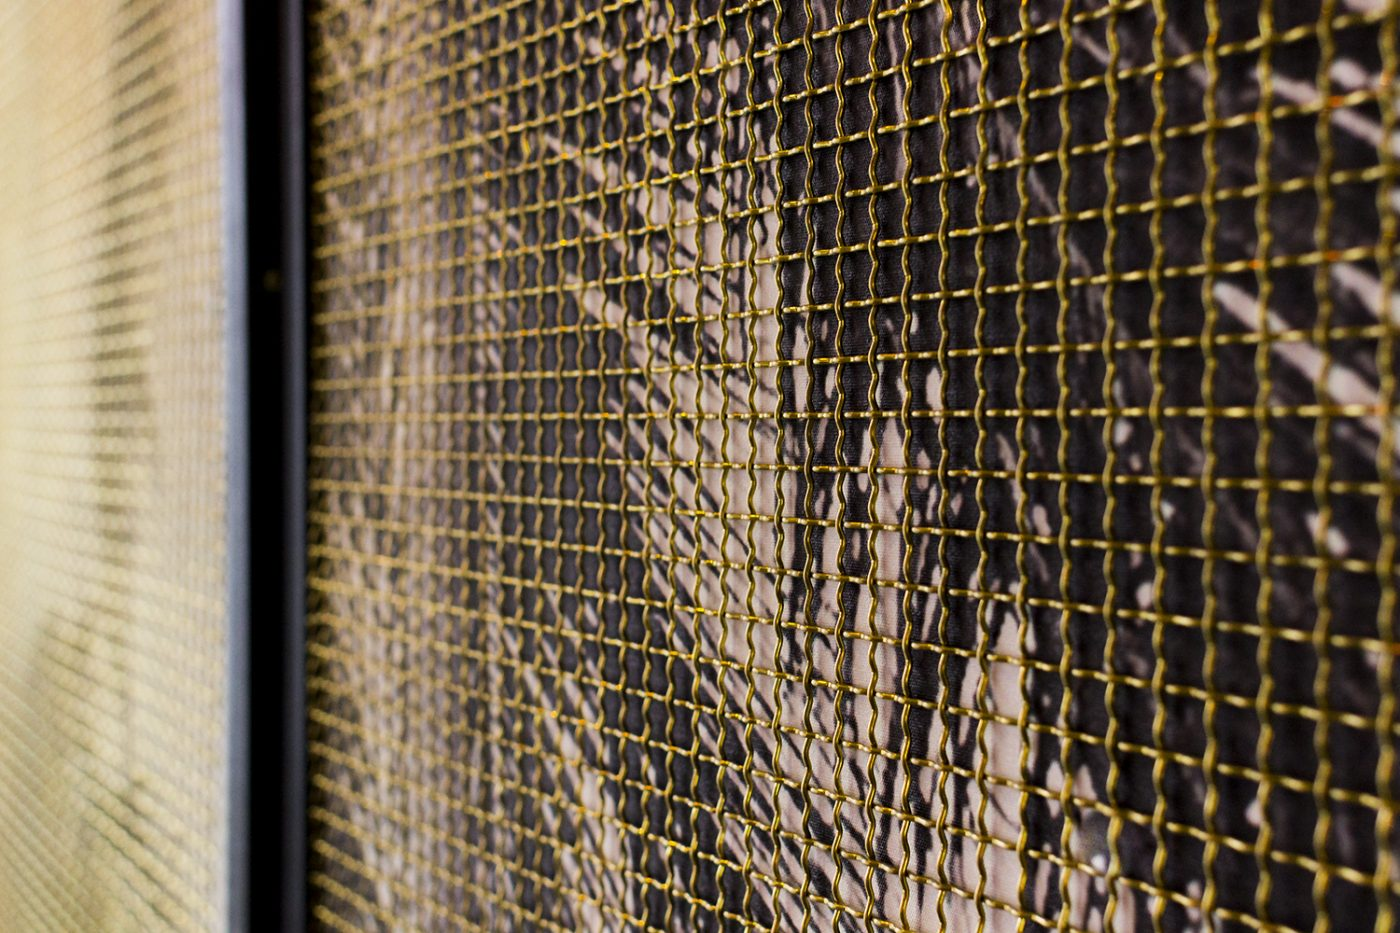 island-poke-mesh-interior-design-decal-cupboards-graphics-hawaiian-poke-cupboards